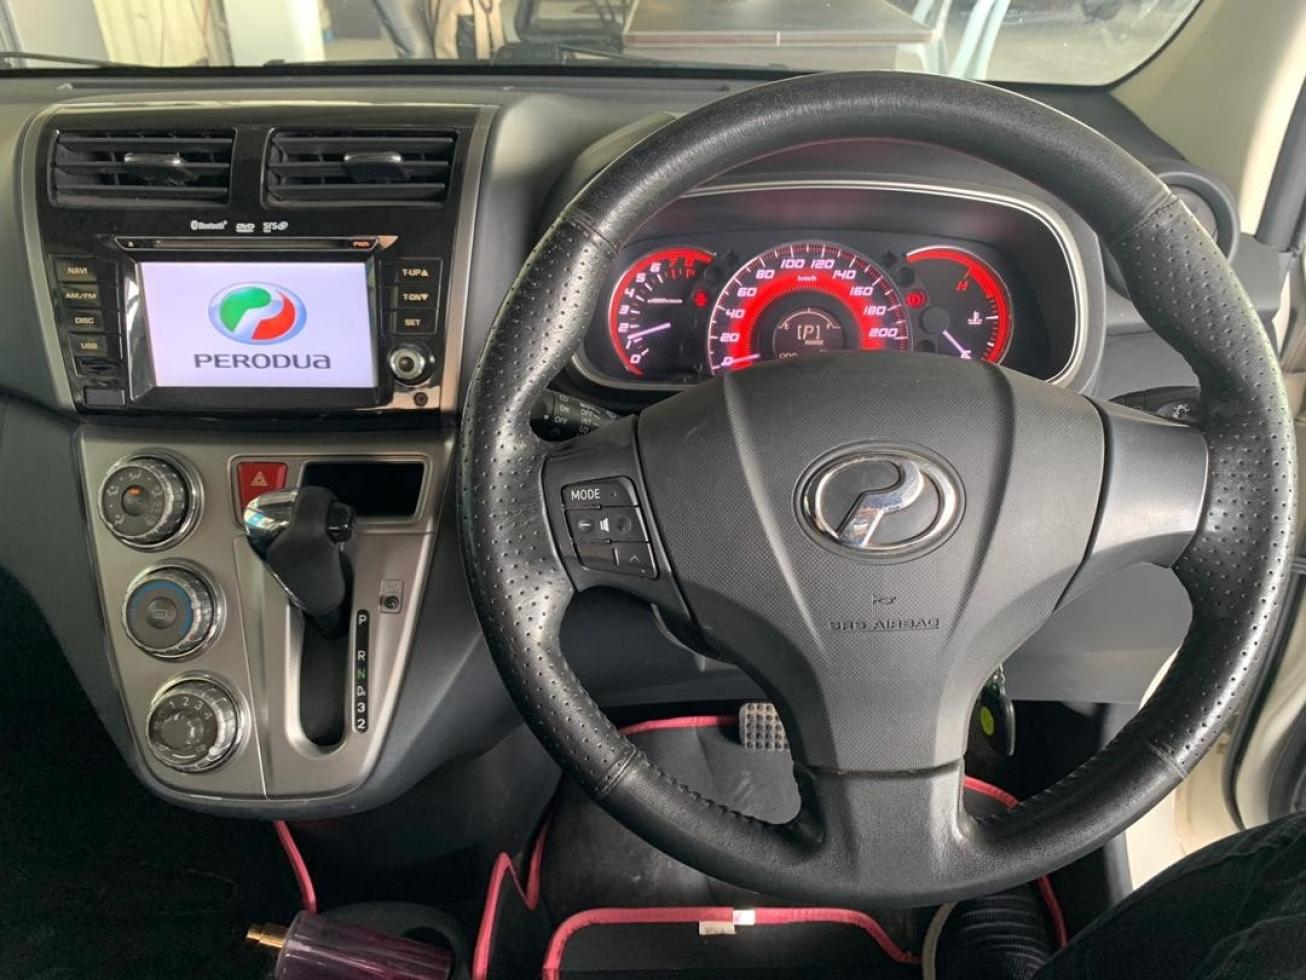 2012 Perodua MYVI 1.5 SE ZHS (A) FULL LOAN